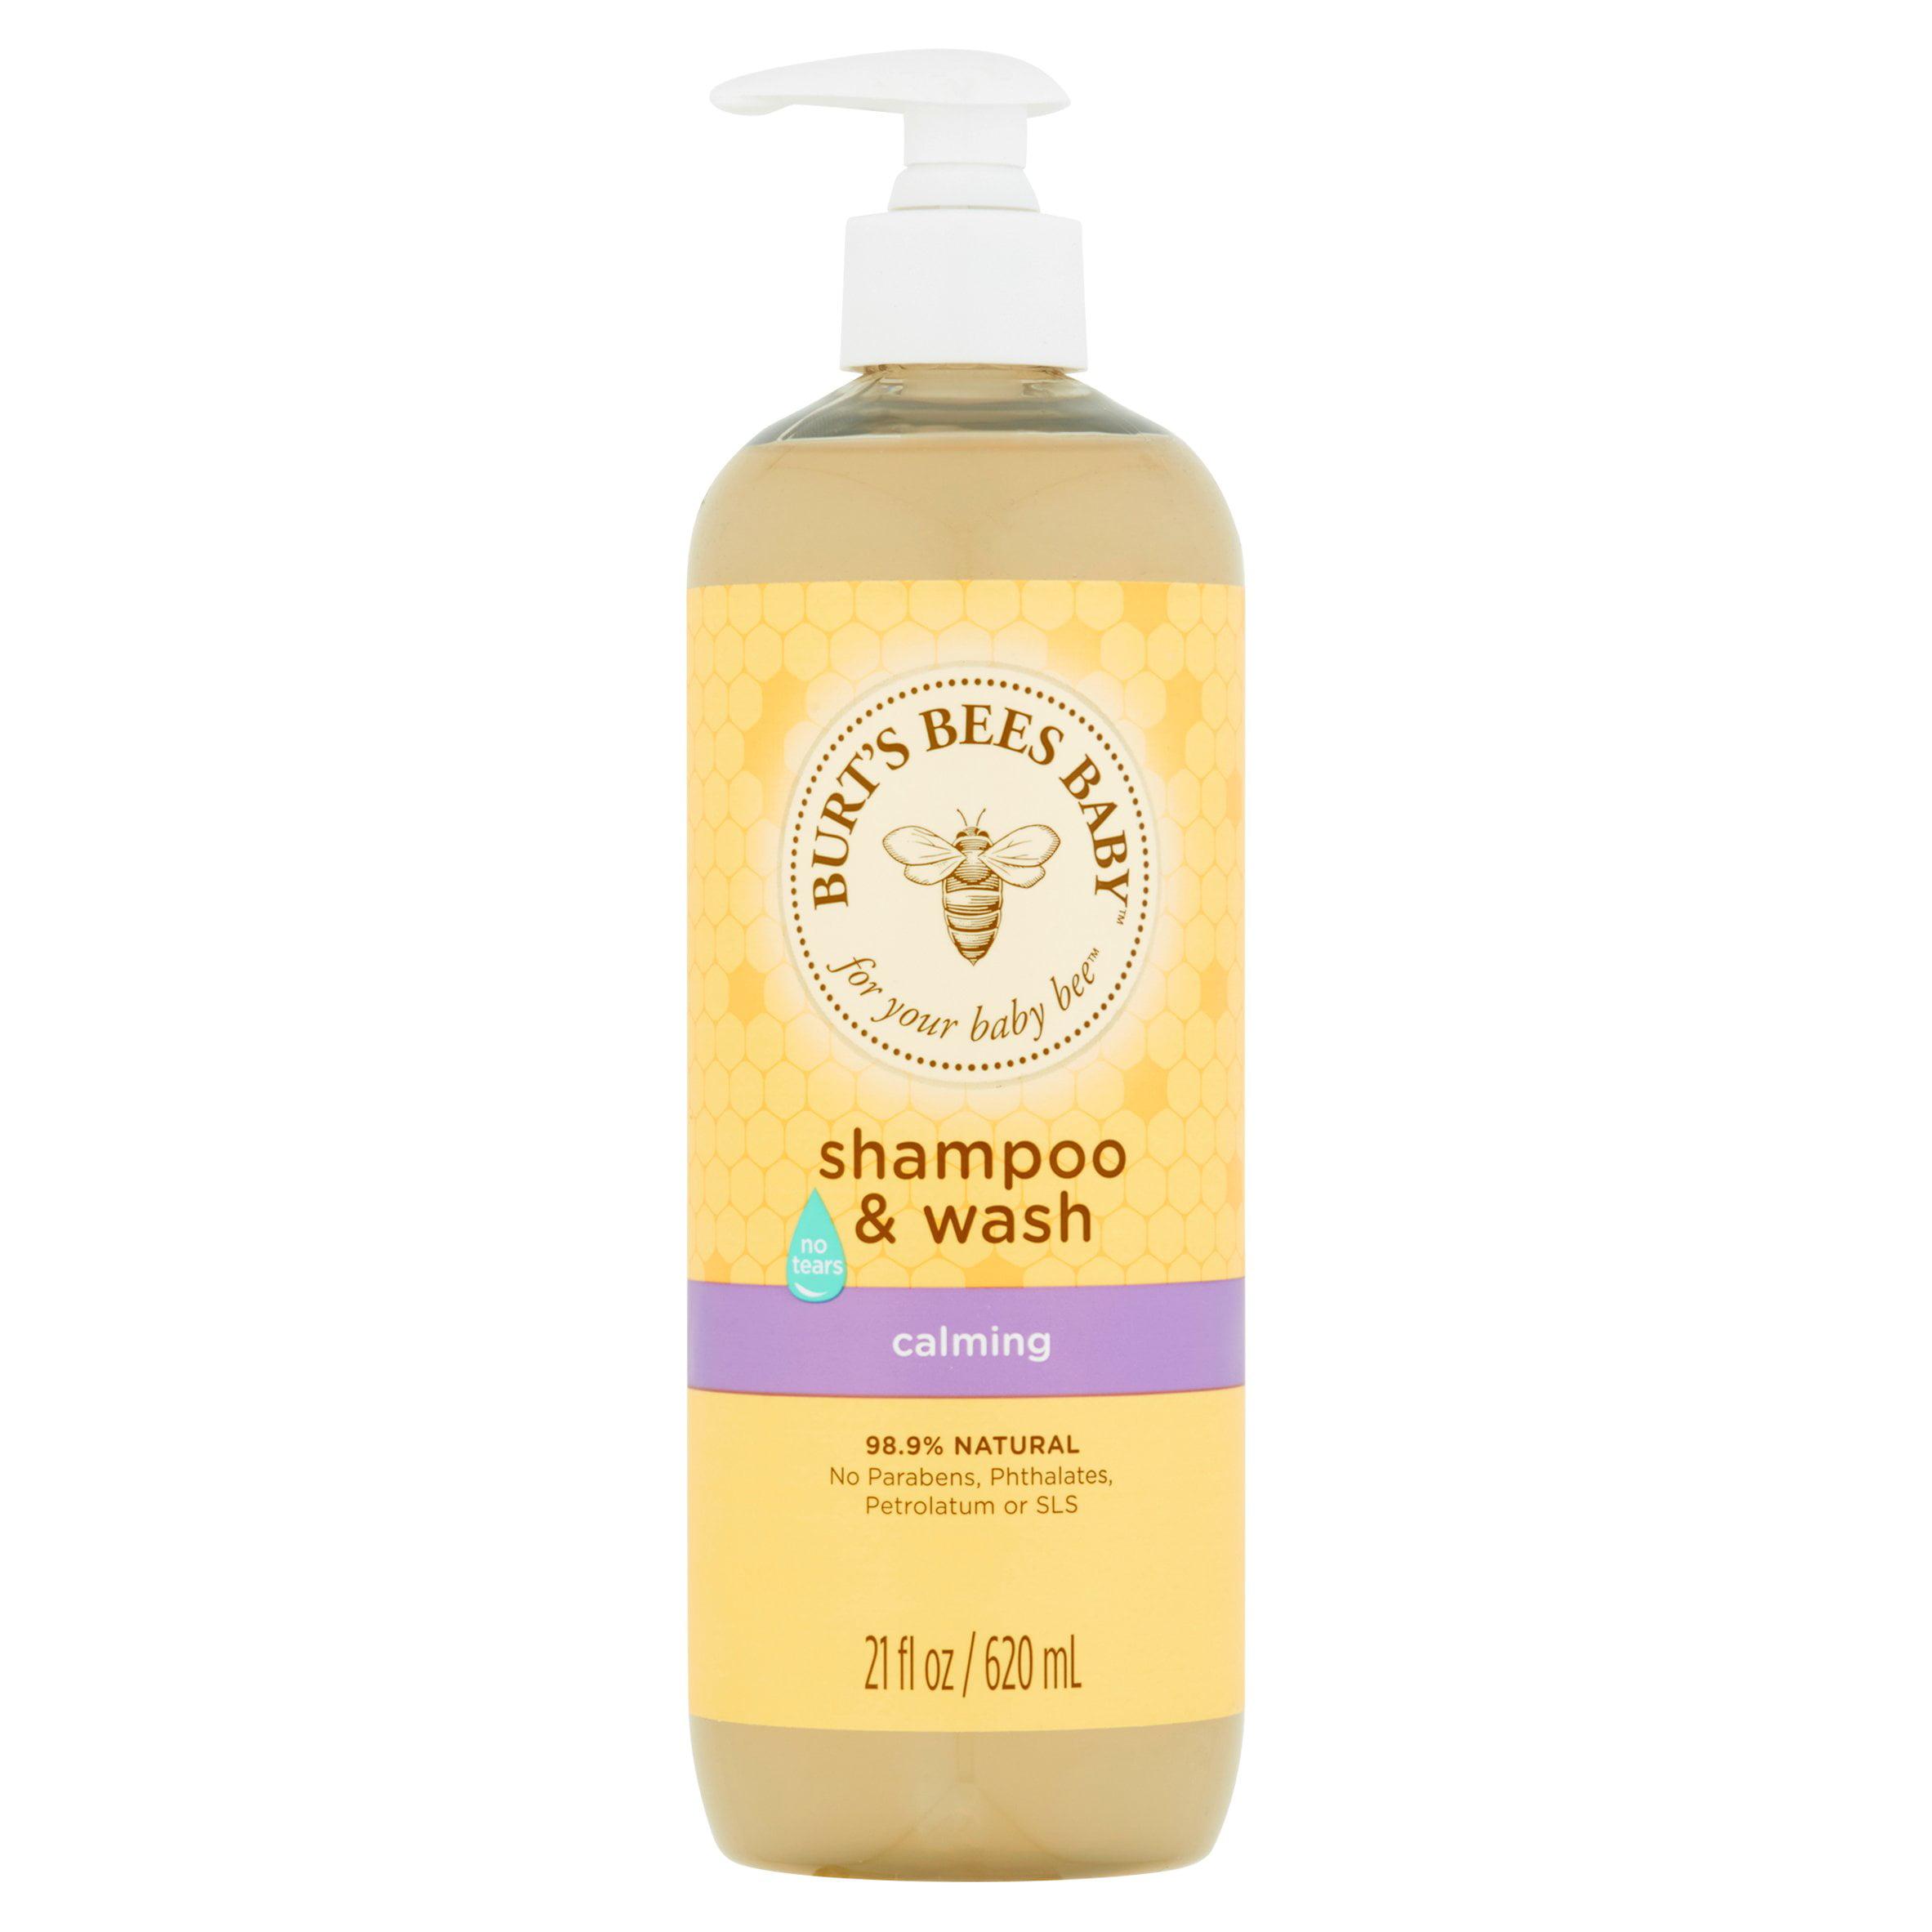 Burt's bees baby shampoo & wash, calming, 21 ounces